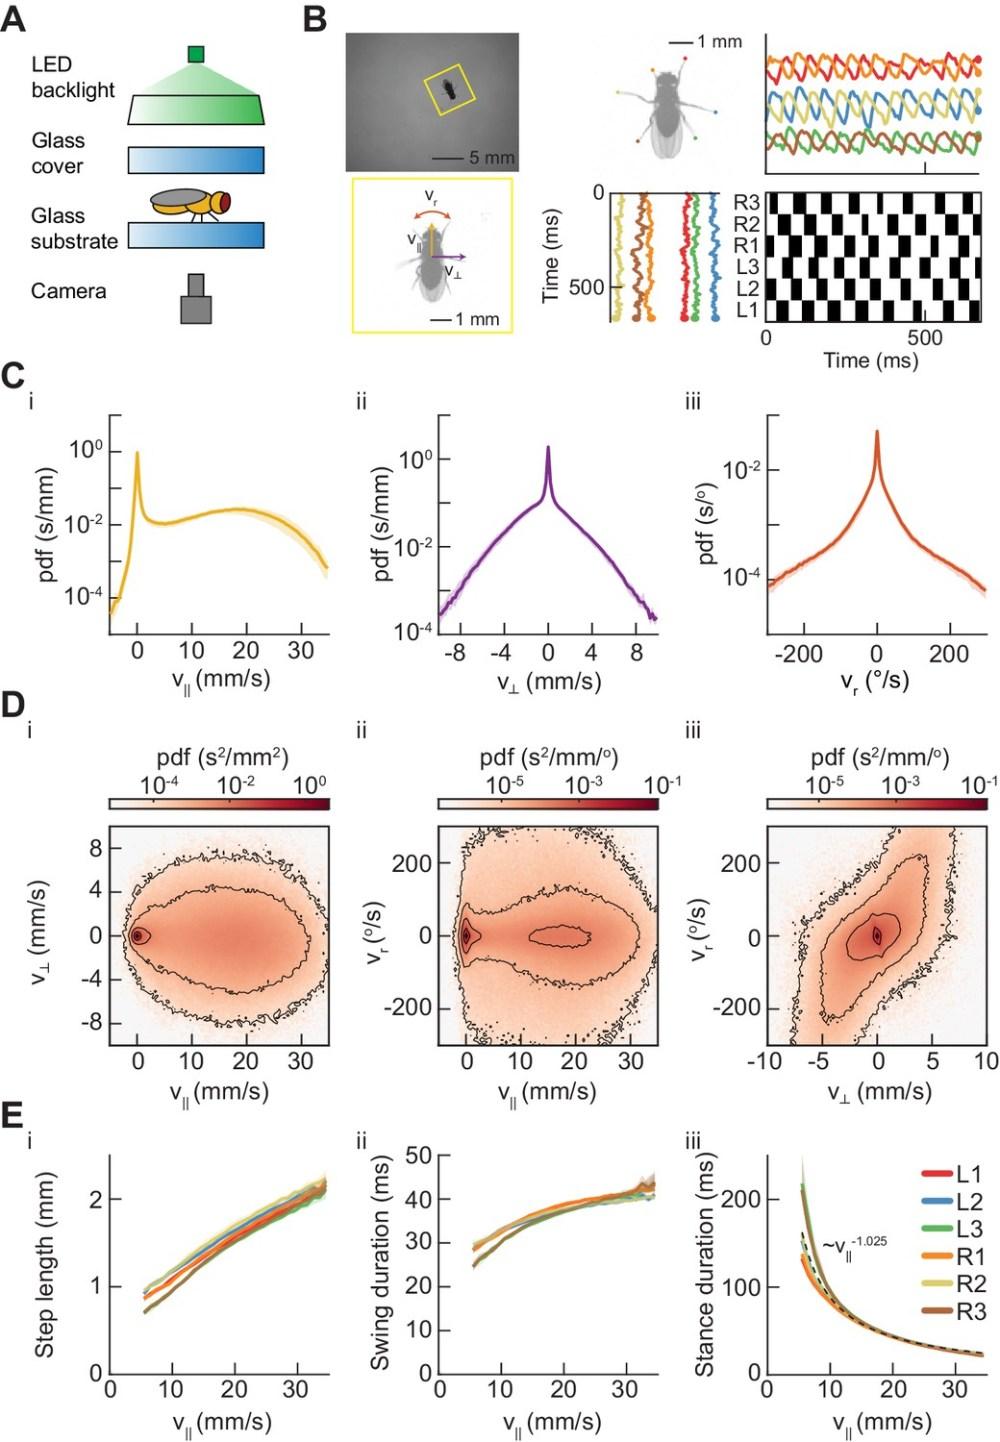 medium resolution of measurements of body and limb kinematics in freely walking drosophila